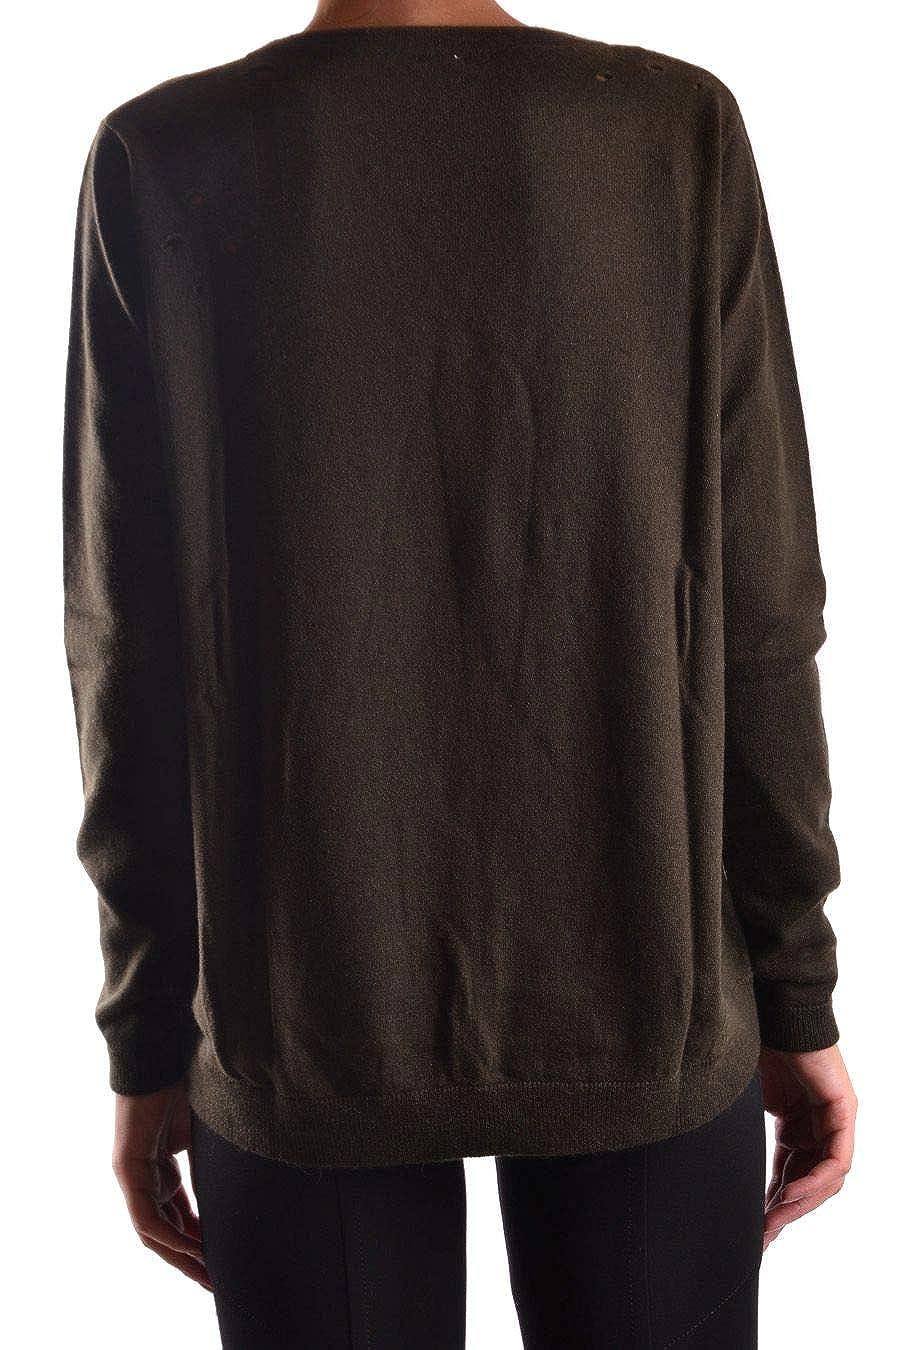 52a14bddc83 Pinko Women's AZIOX18 Green Wool Sweater at Amazon Women's Clothing store: